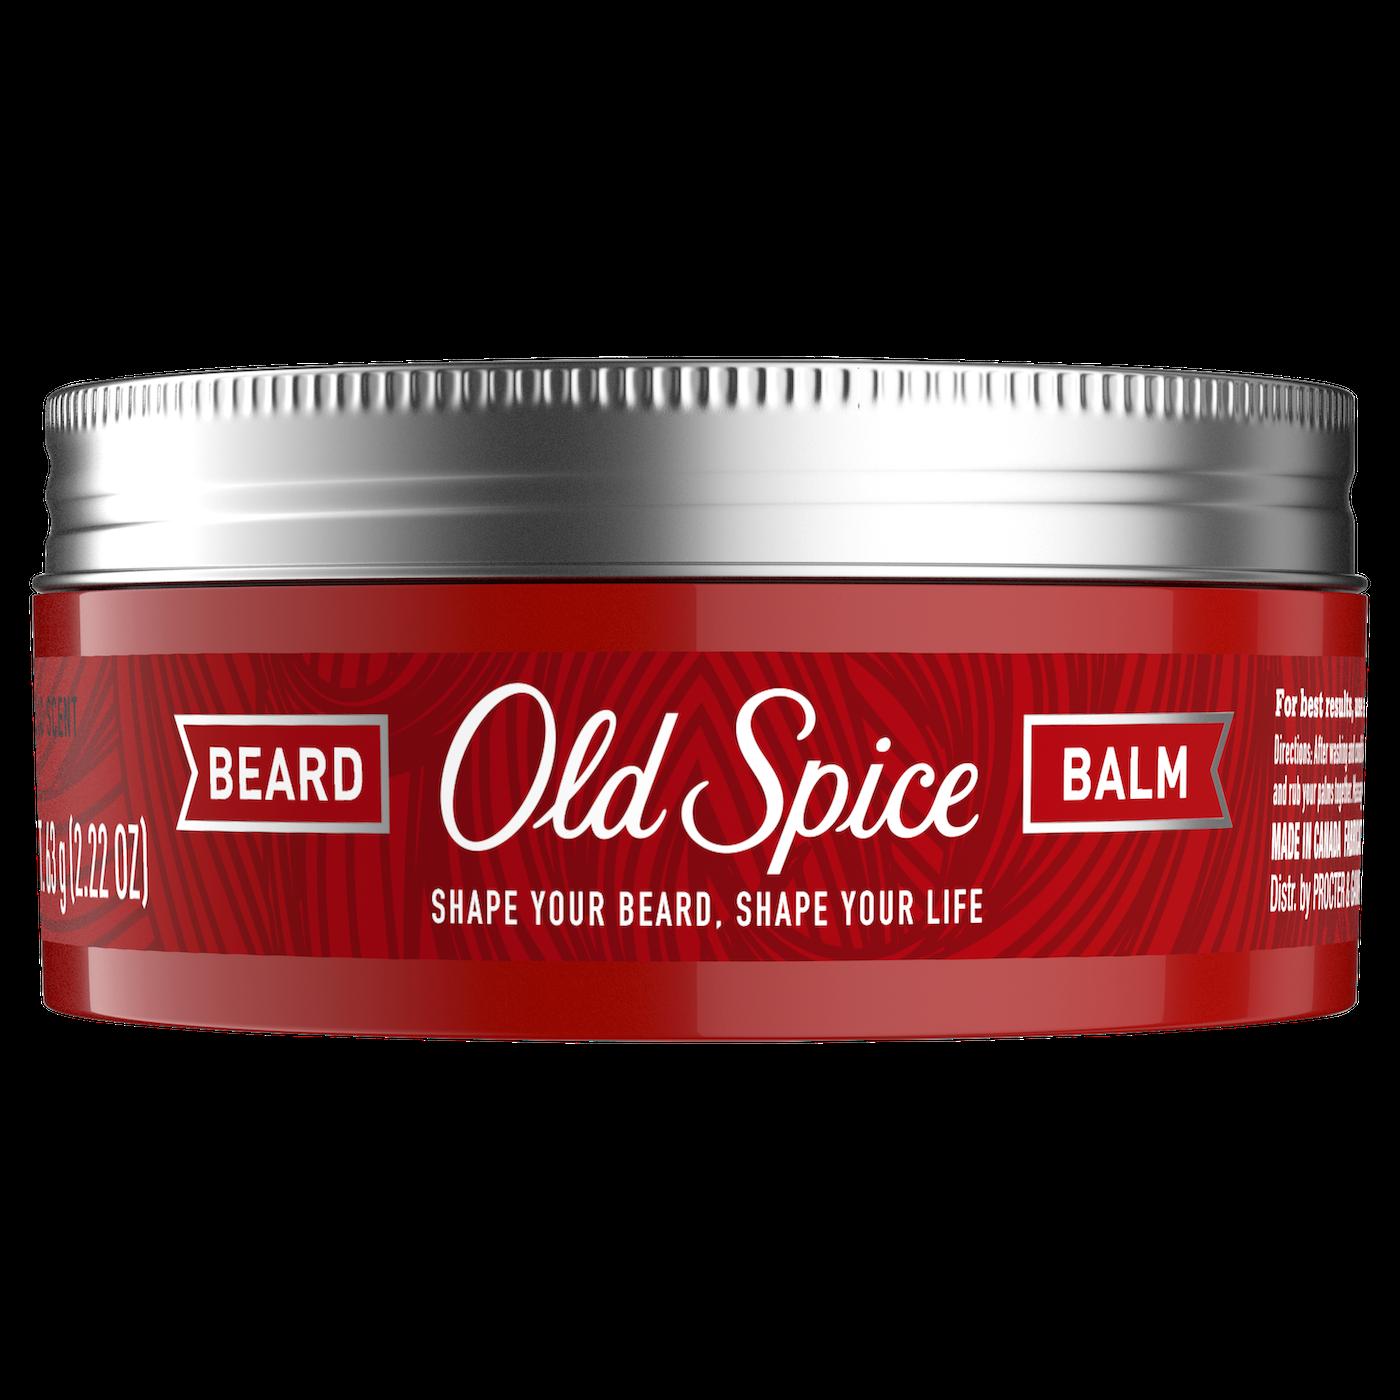 Old Spice Beard Balm